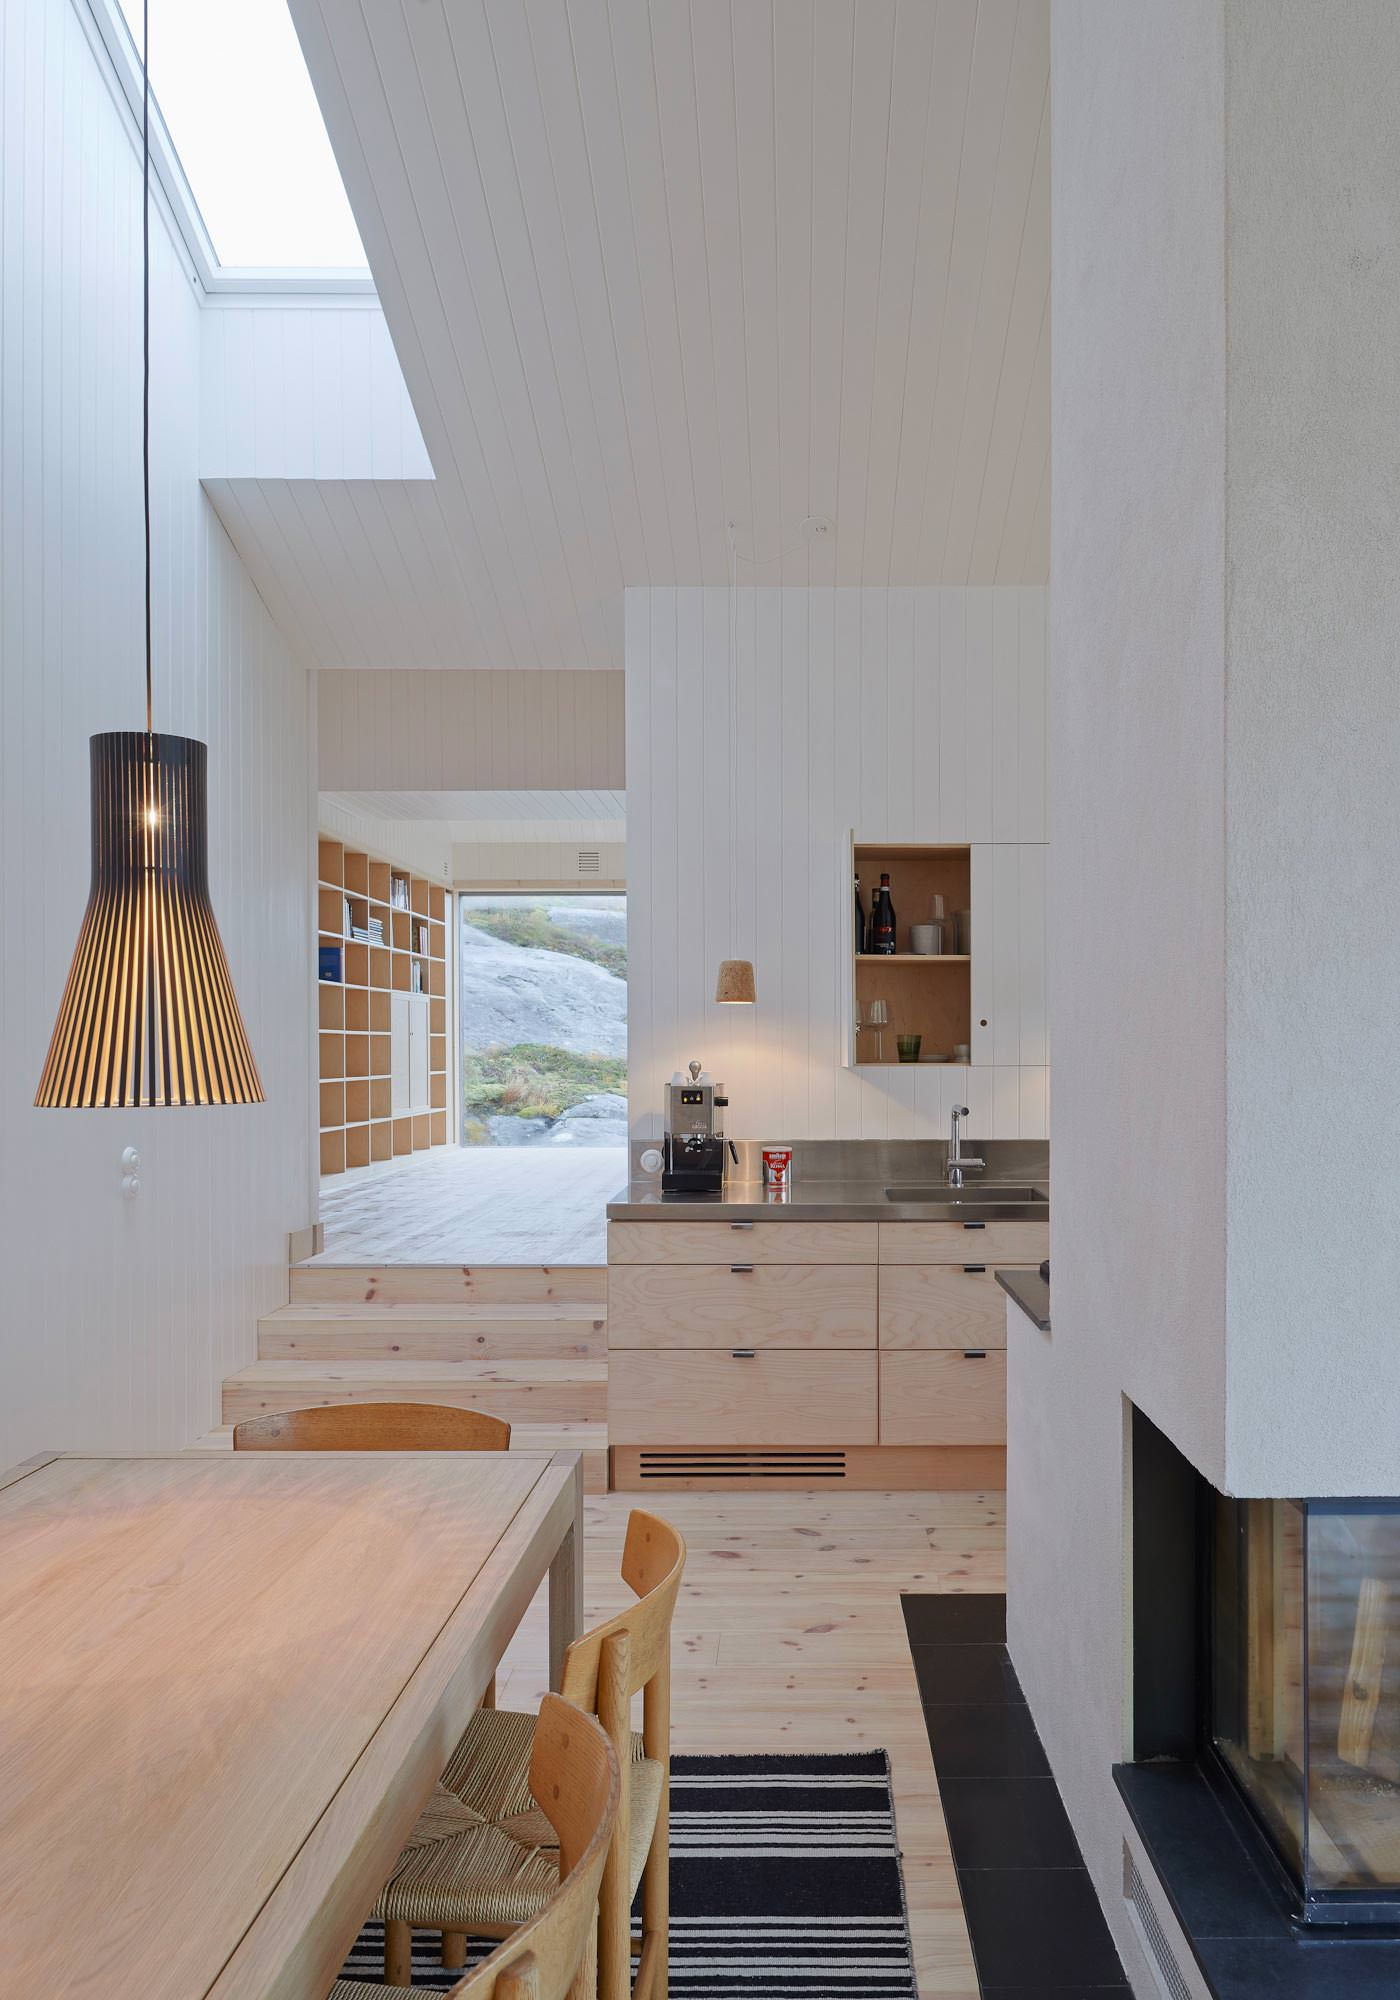 Maison d'écrivains, Vega Cottage, Archipel de Vega Norvège, Kolman Boye Architects